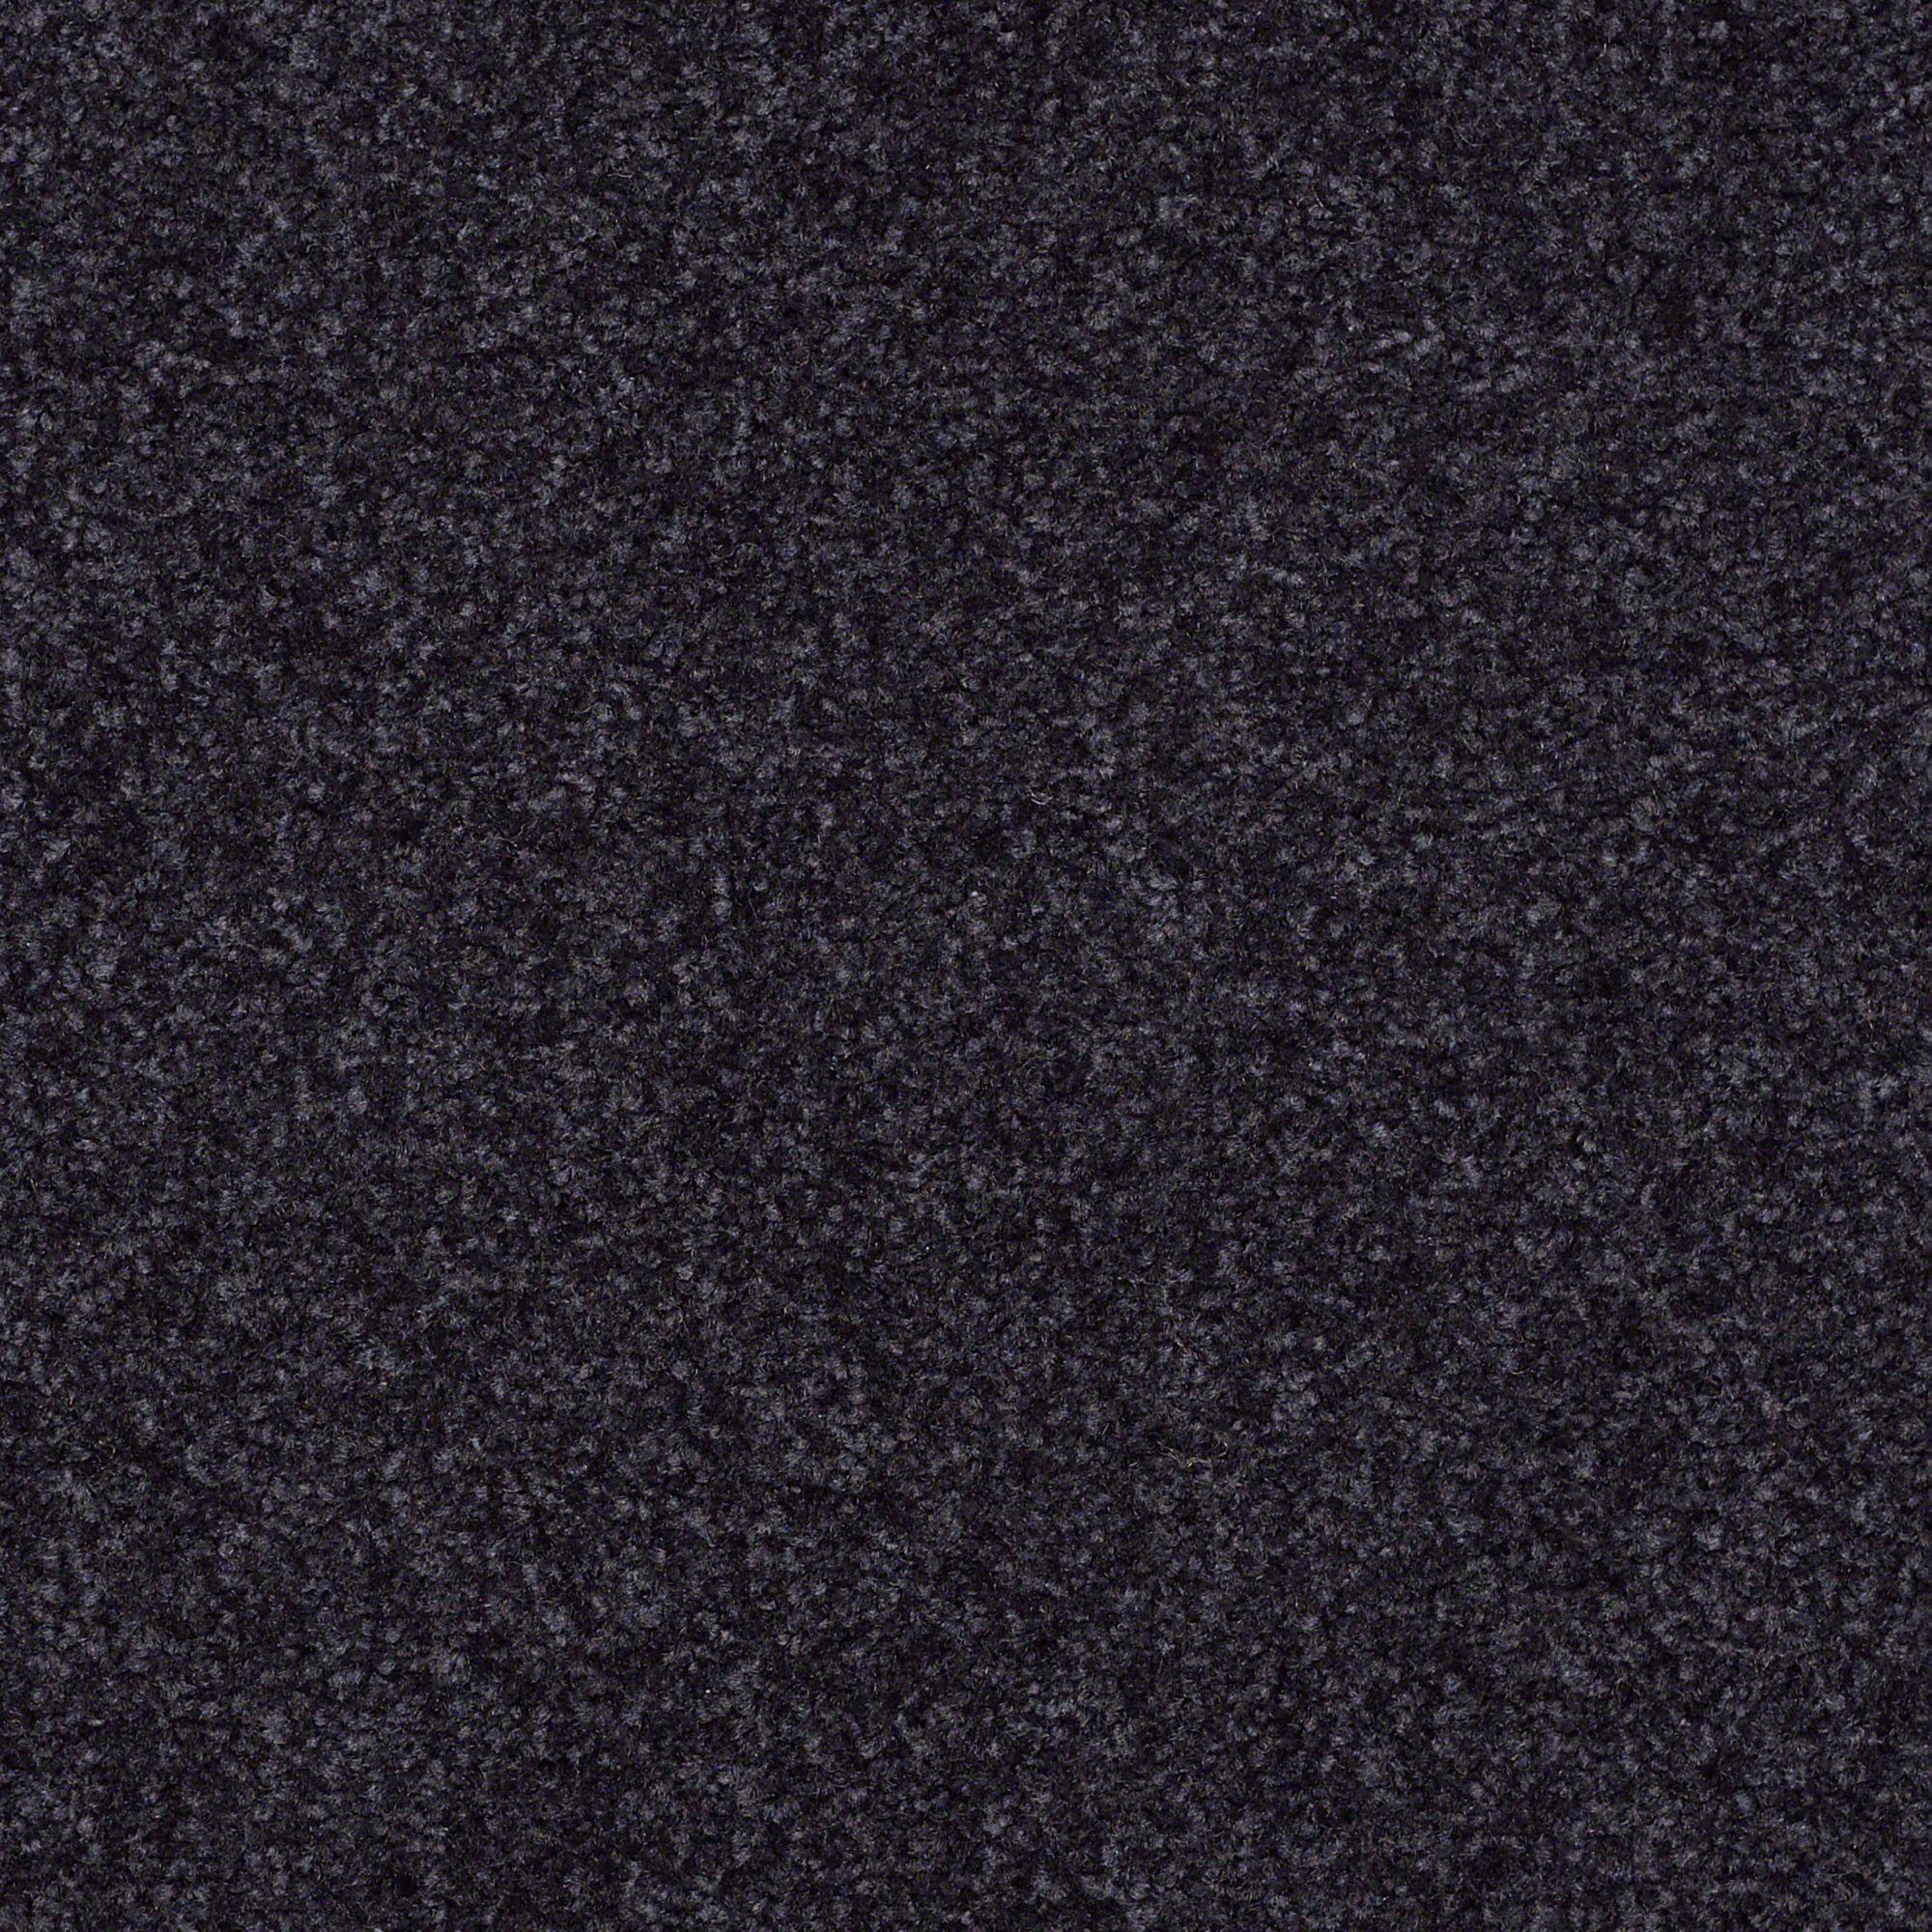 Harborfields Iii 15 Midnight Sky Carpet Flooring